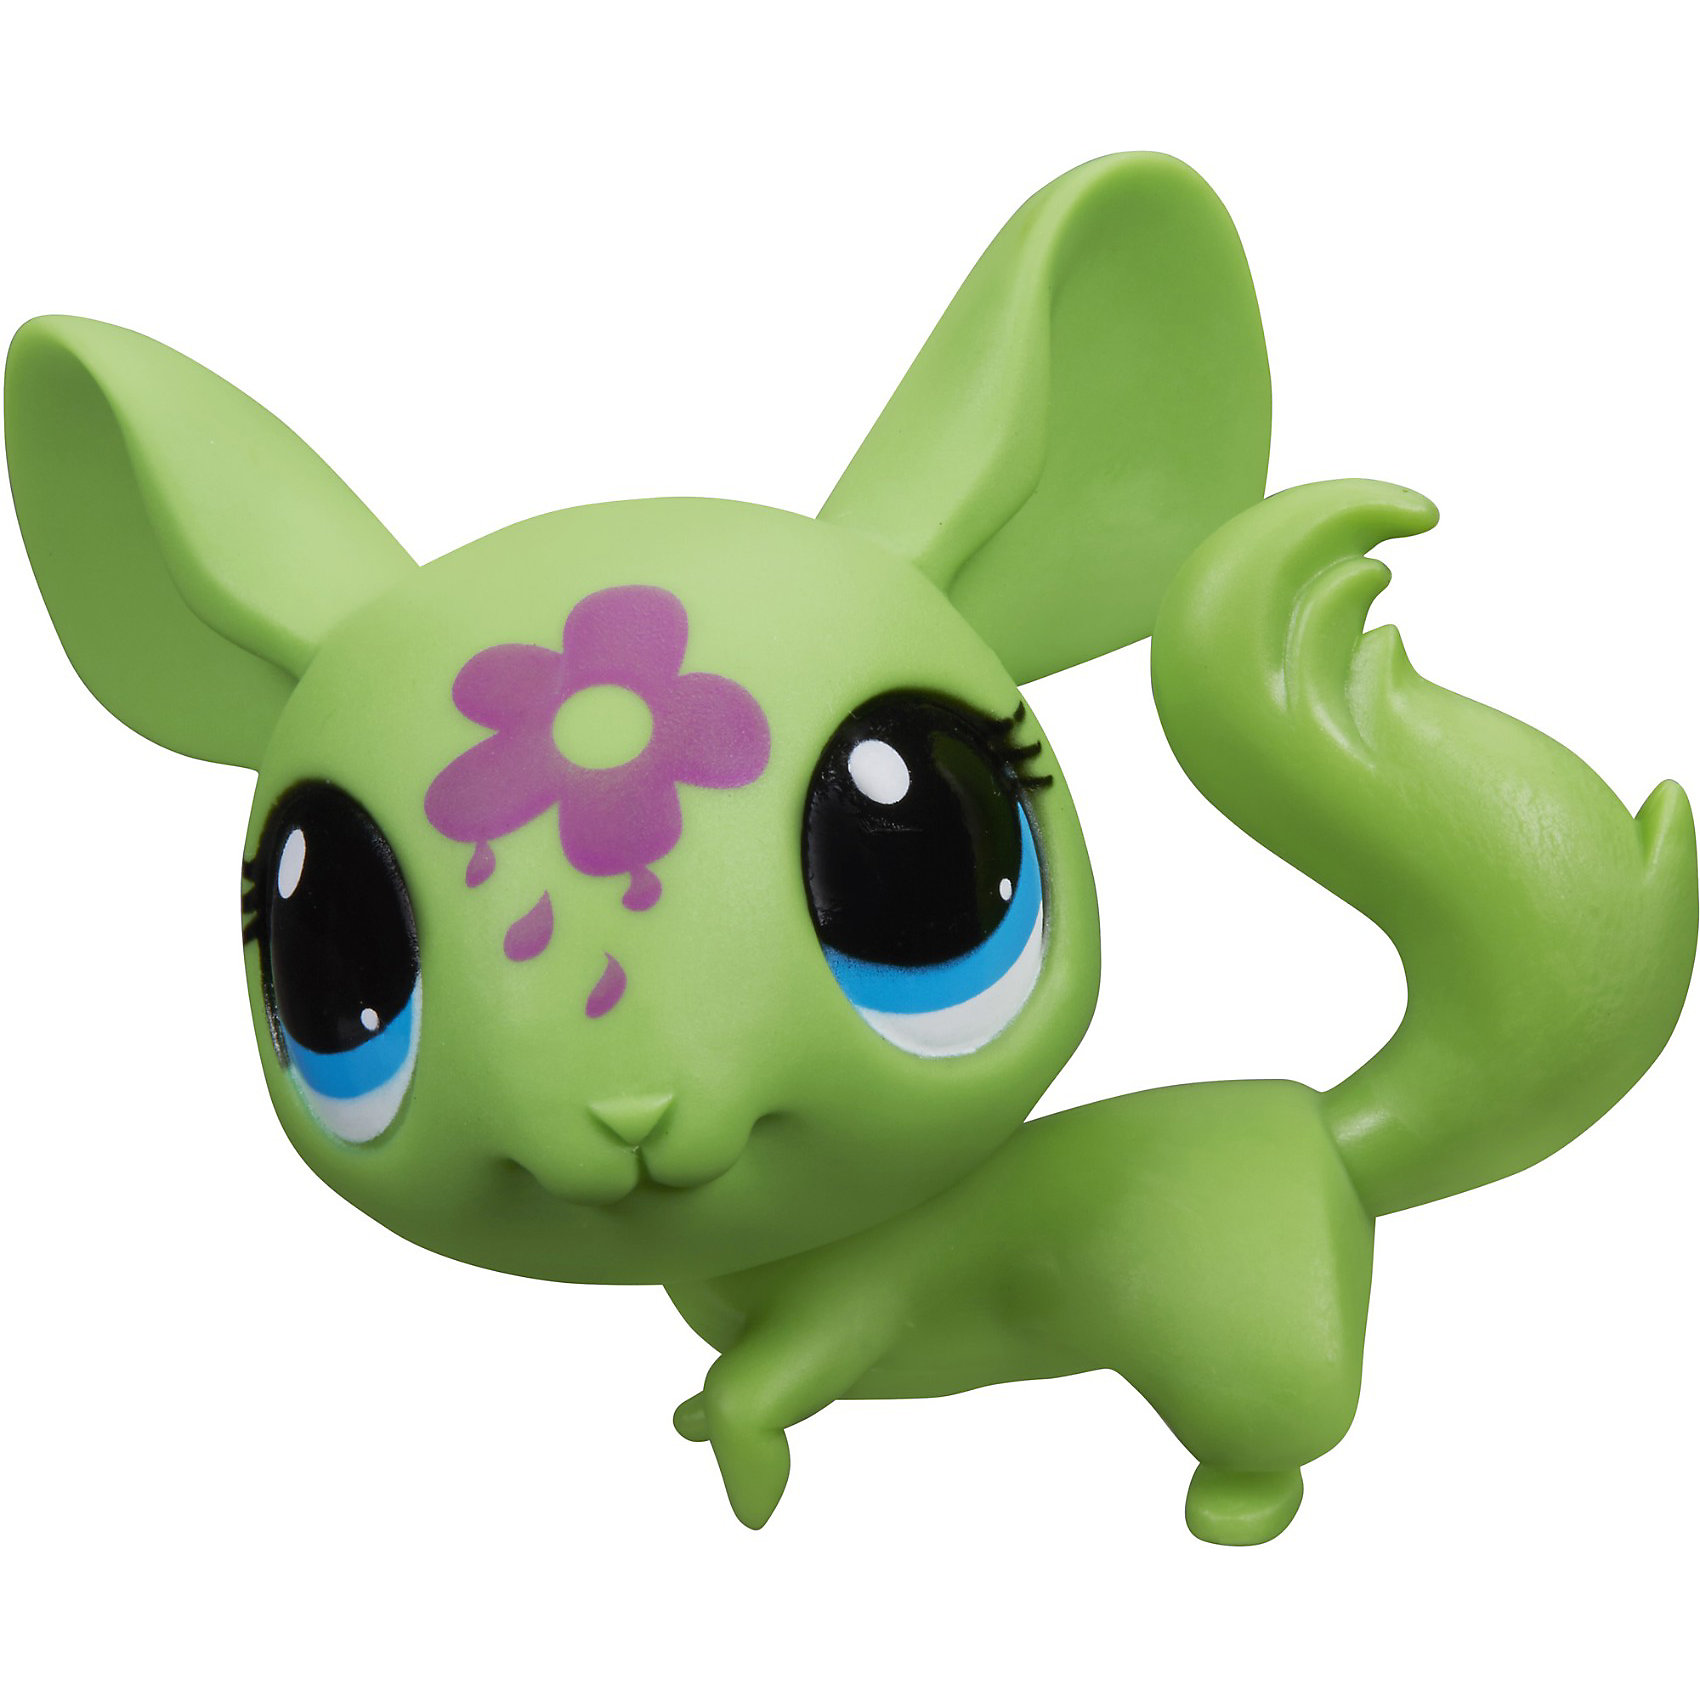 Hasbro Зверюшка в закрытой упаковке, Littlest Pet Shop фигурка littlest pet shop зверюшка в закрытой упаковке 5 см в ассортименте